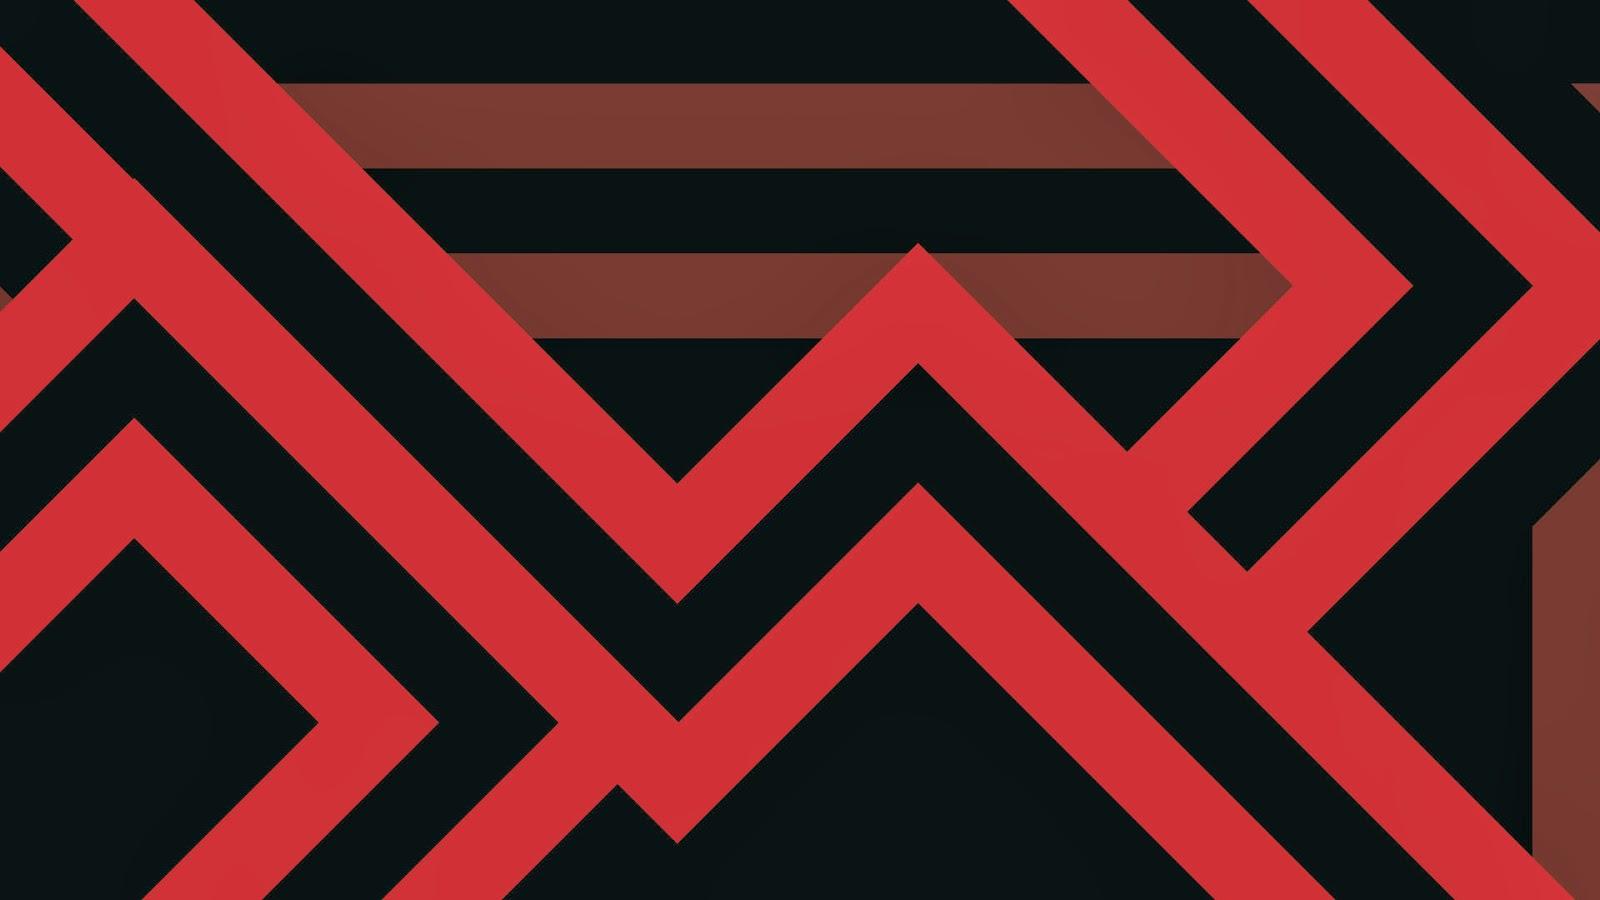 HD Wallpapers Gratis: Fondo De Pantalla Abstracto Lineas Rojas